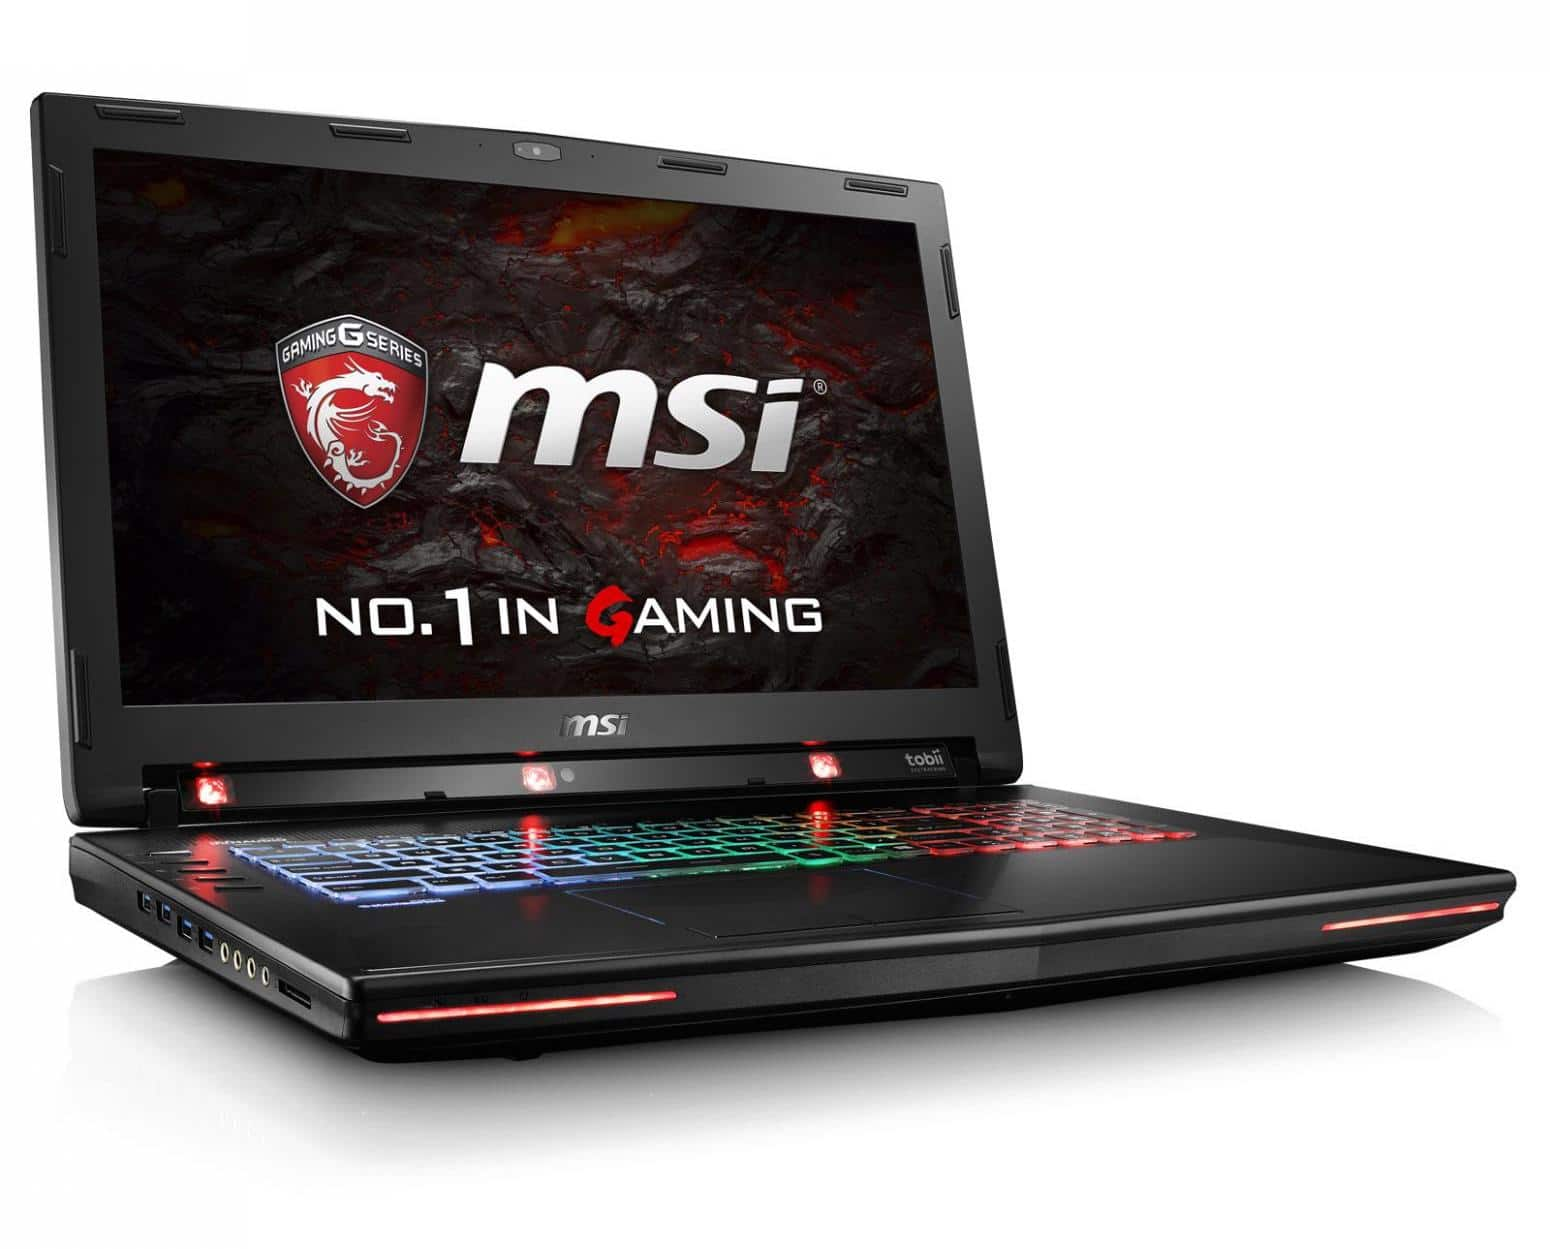 "<span class=""toptagtitre"">Promo ! </span>MSI GT72VR 6RE-273X, PC portable 17"" GTX 1070 SSD256 Quad i7 1484€"